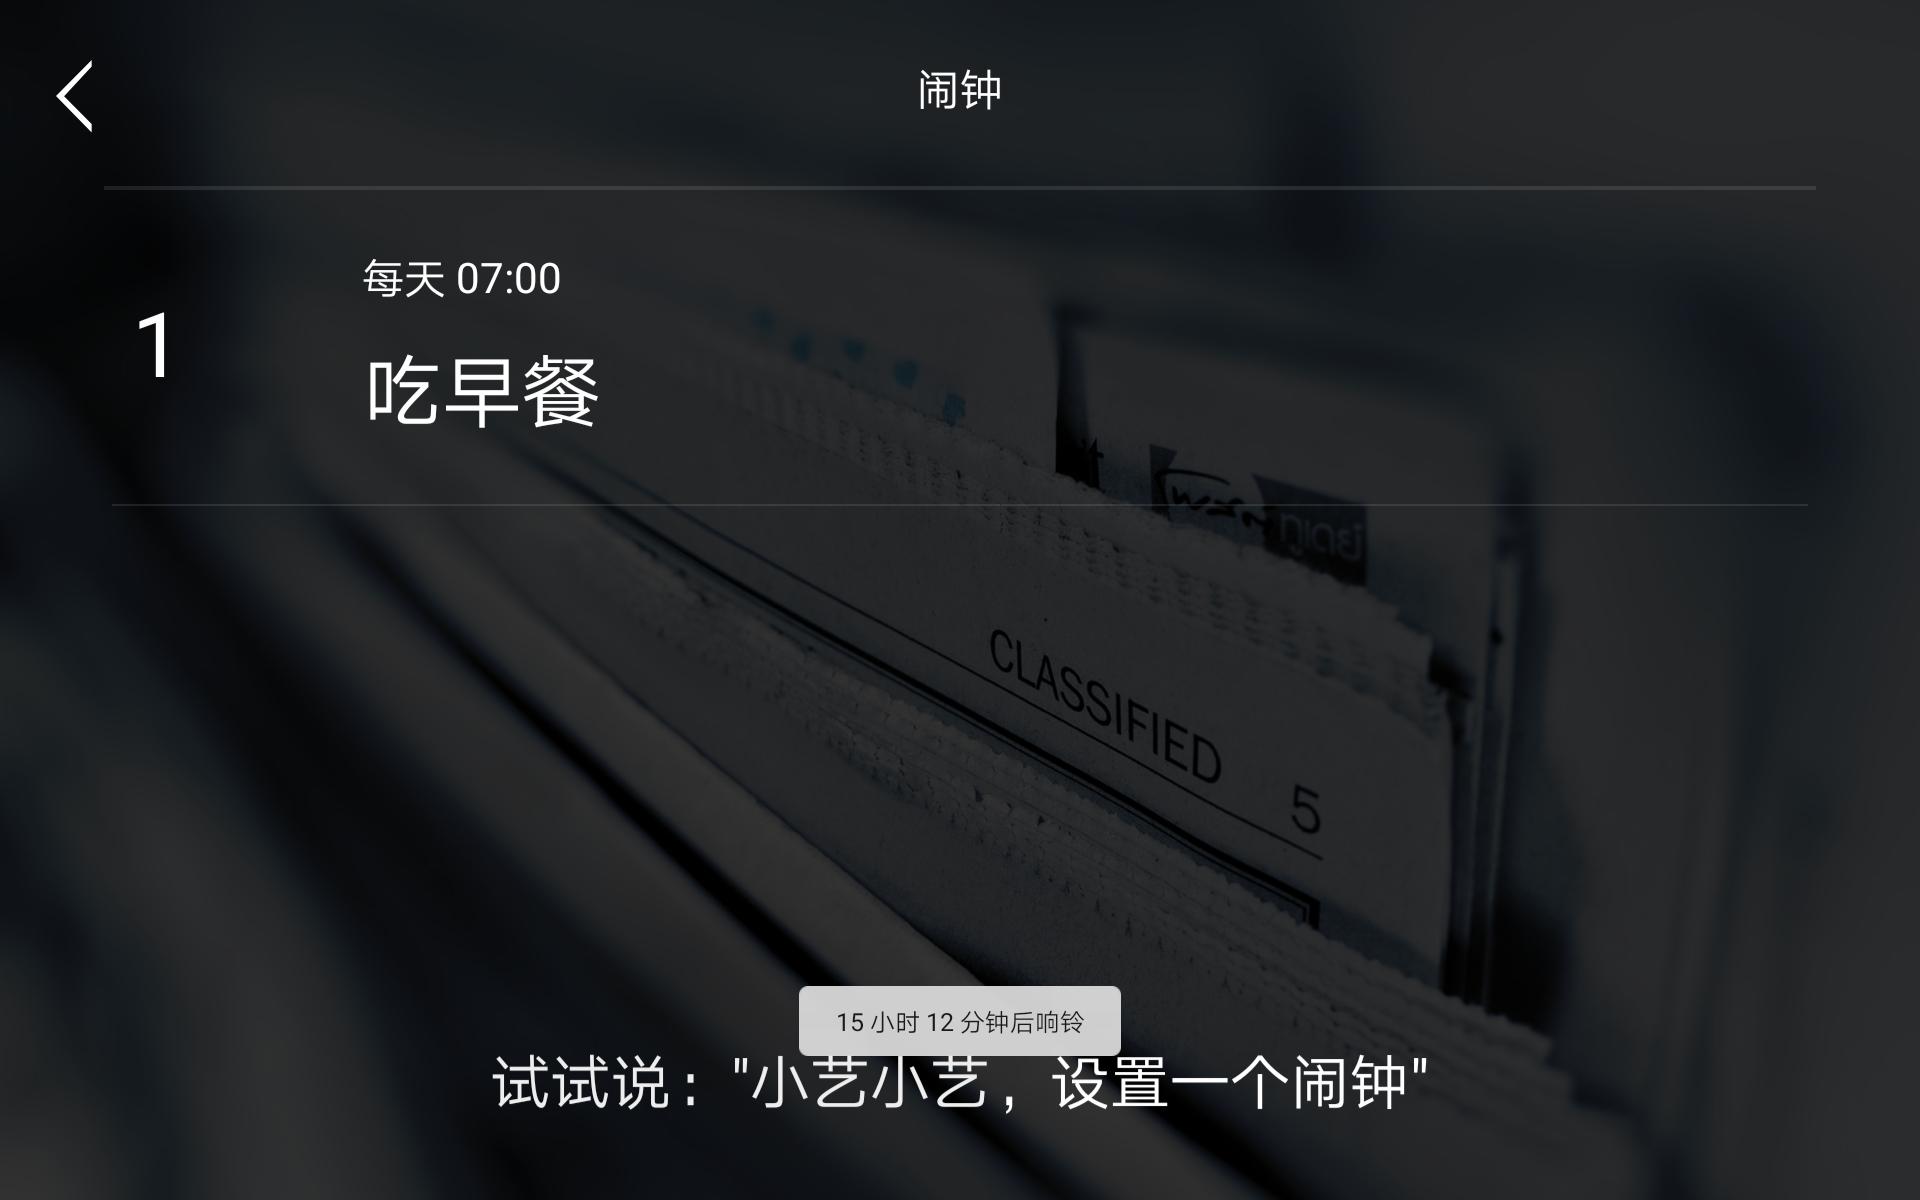 Screenshot_20190414_154738_com.baidu.launcher.jpg